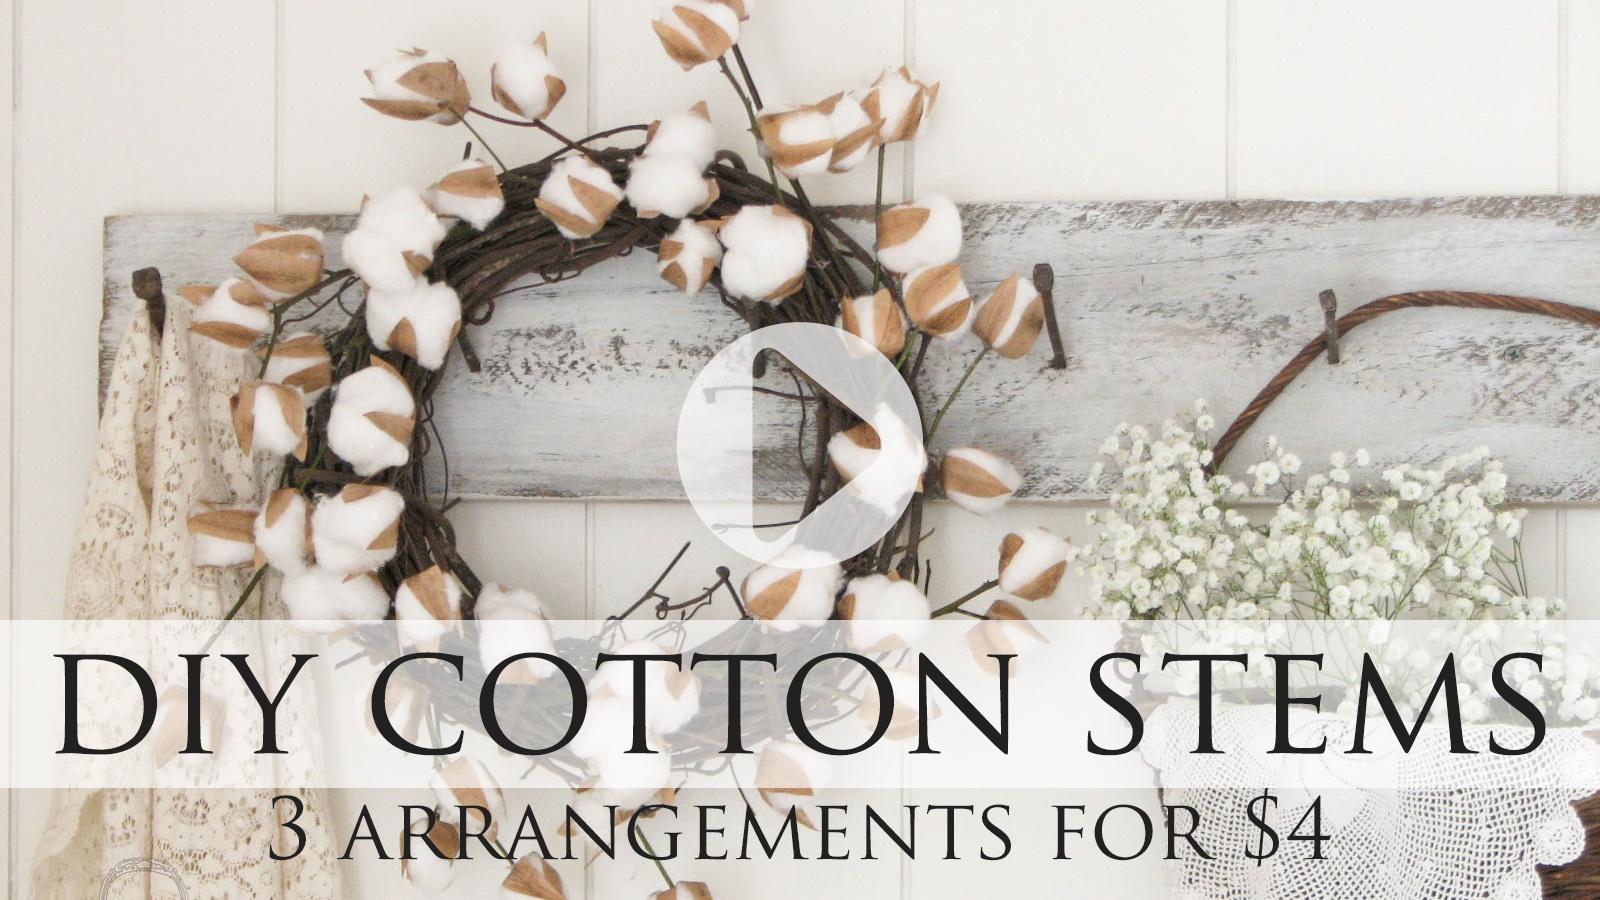 DIY Cotton Stem Tutorial by Larissa of Prodigal Pieces | prodigalpieces.com #prodigalpieces